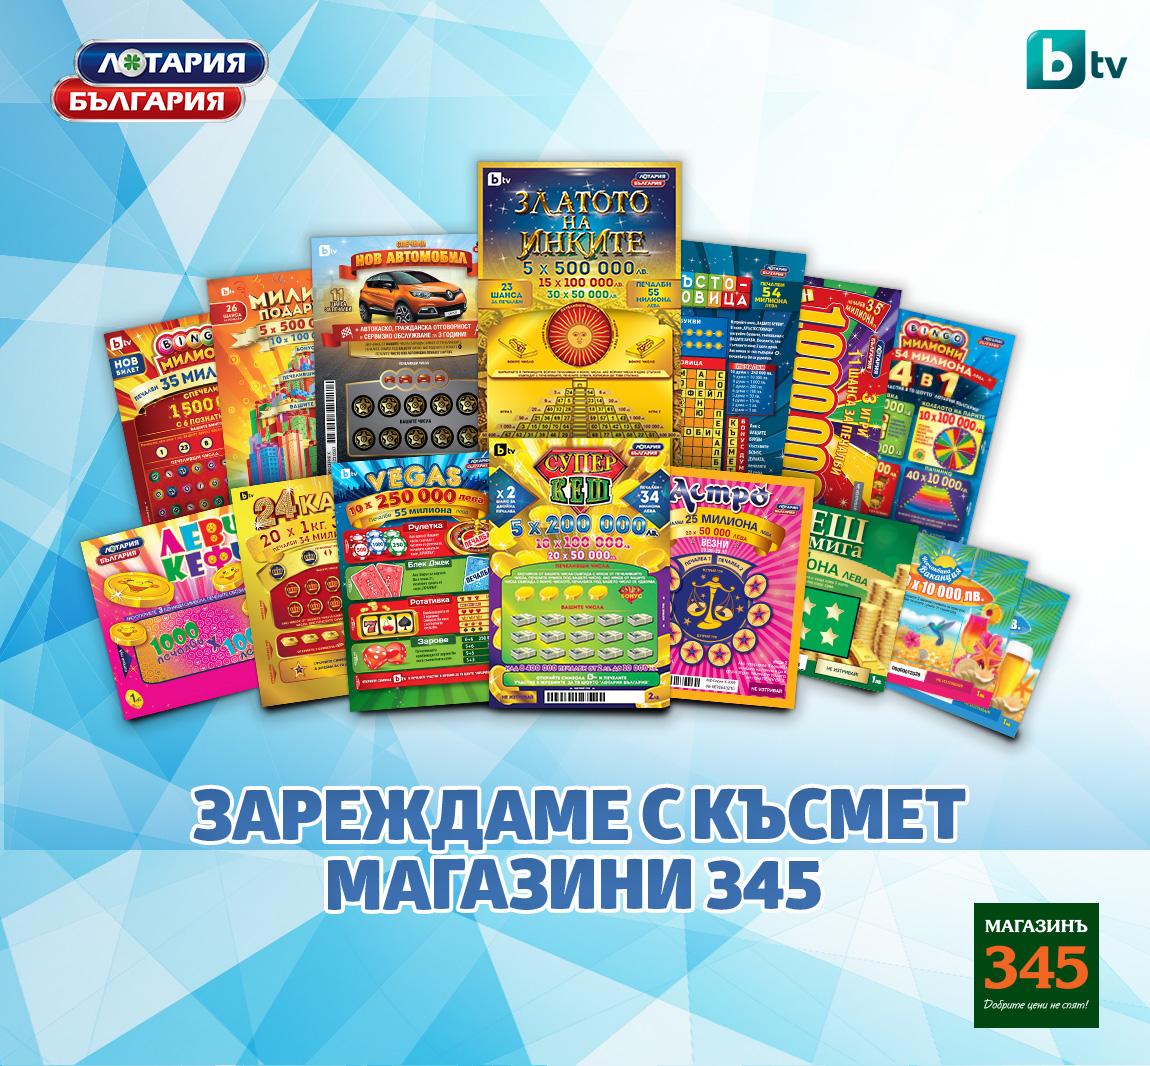 Лотария България Магазин 345